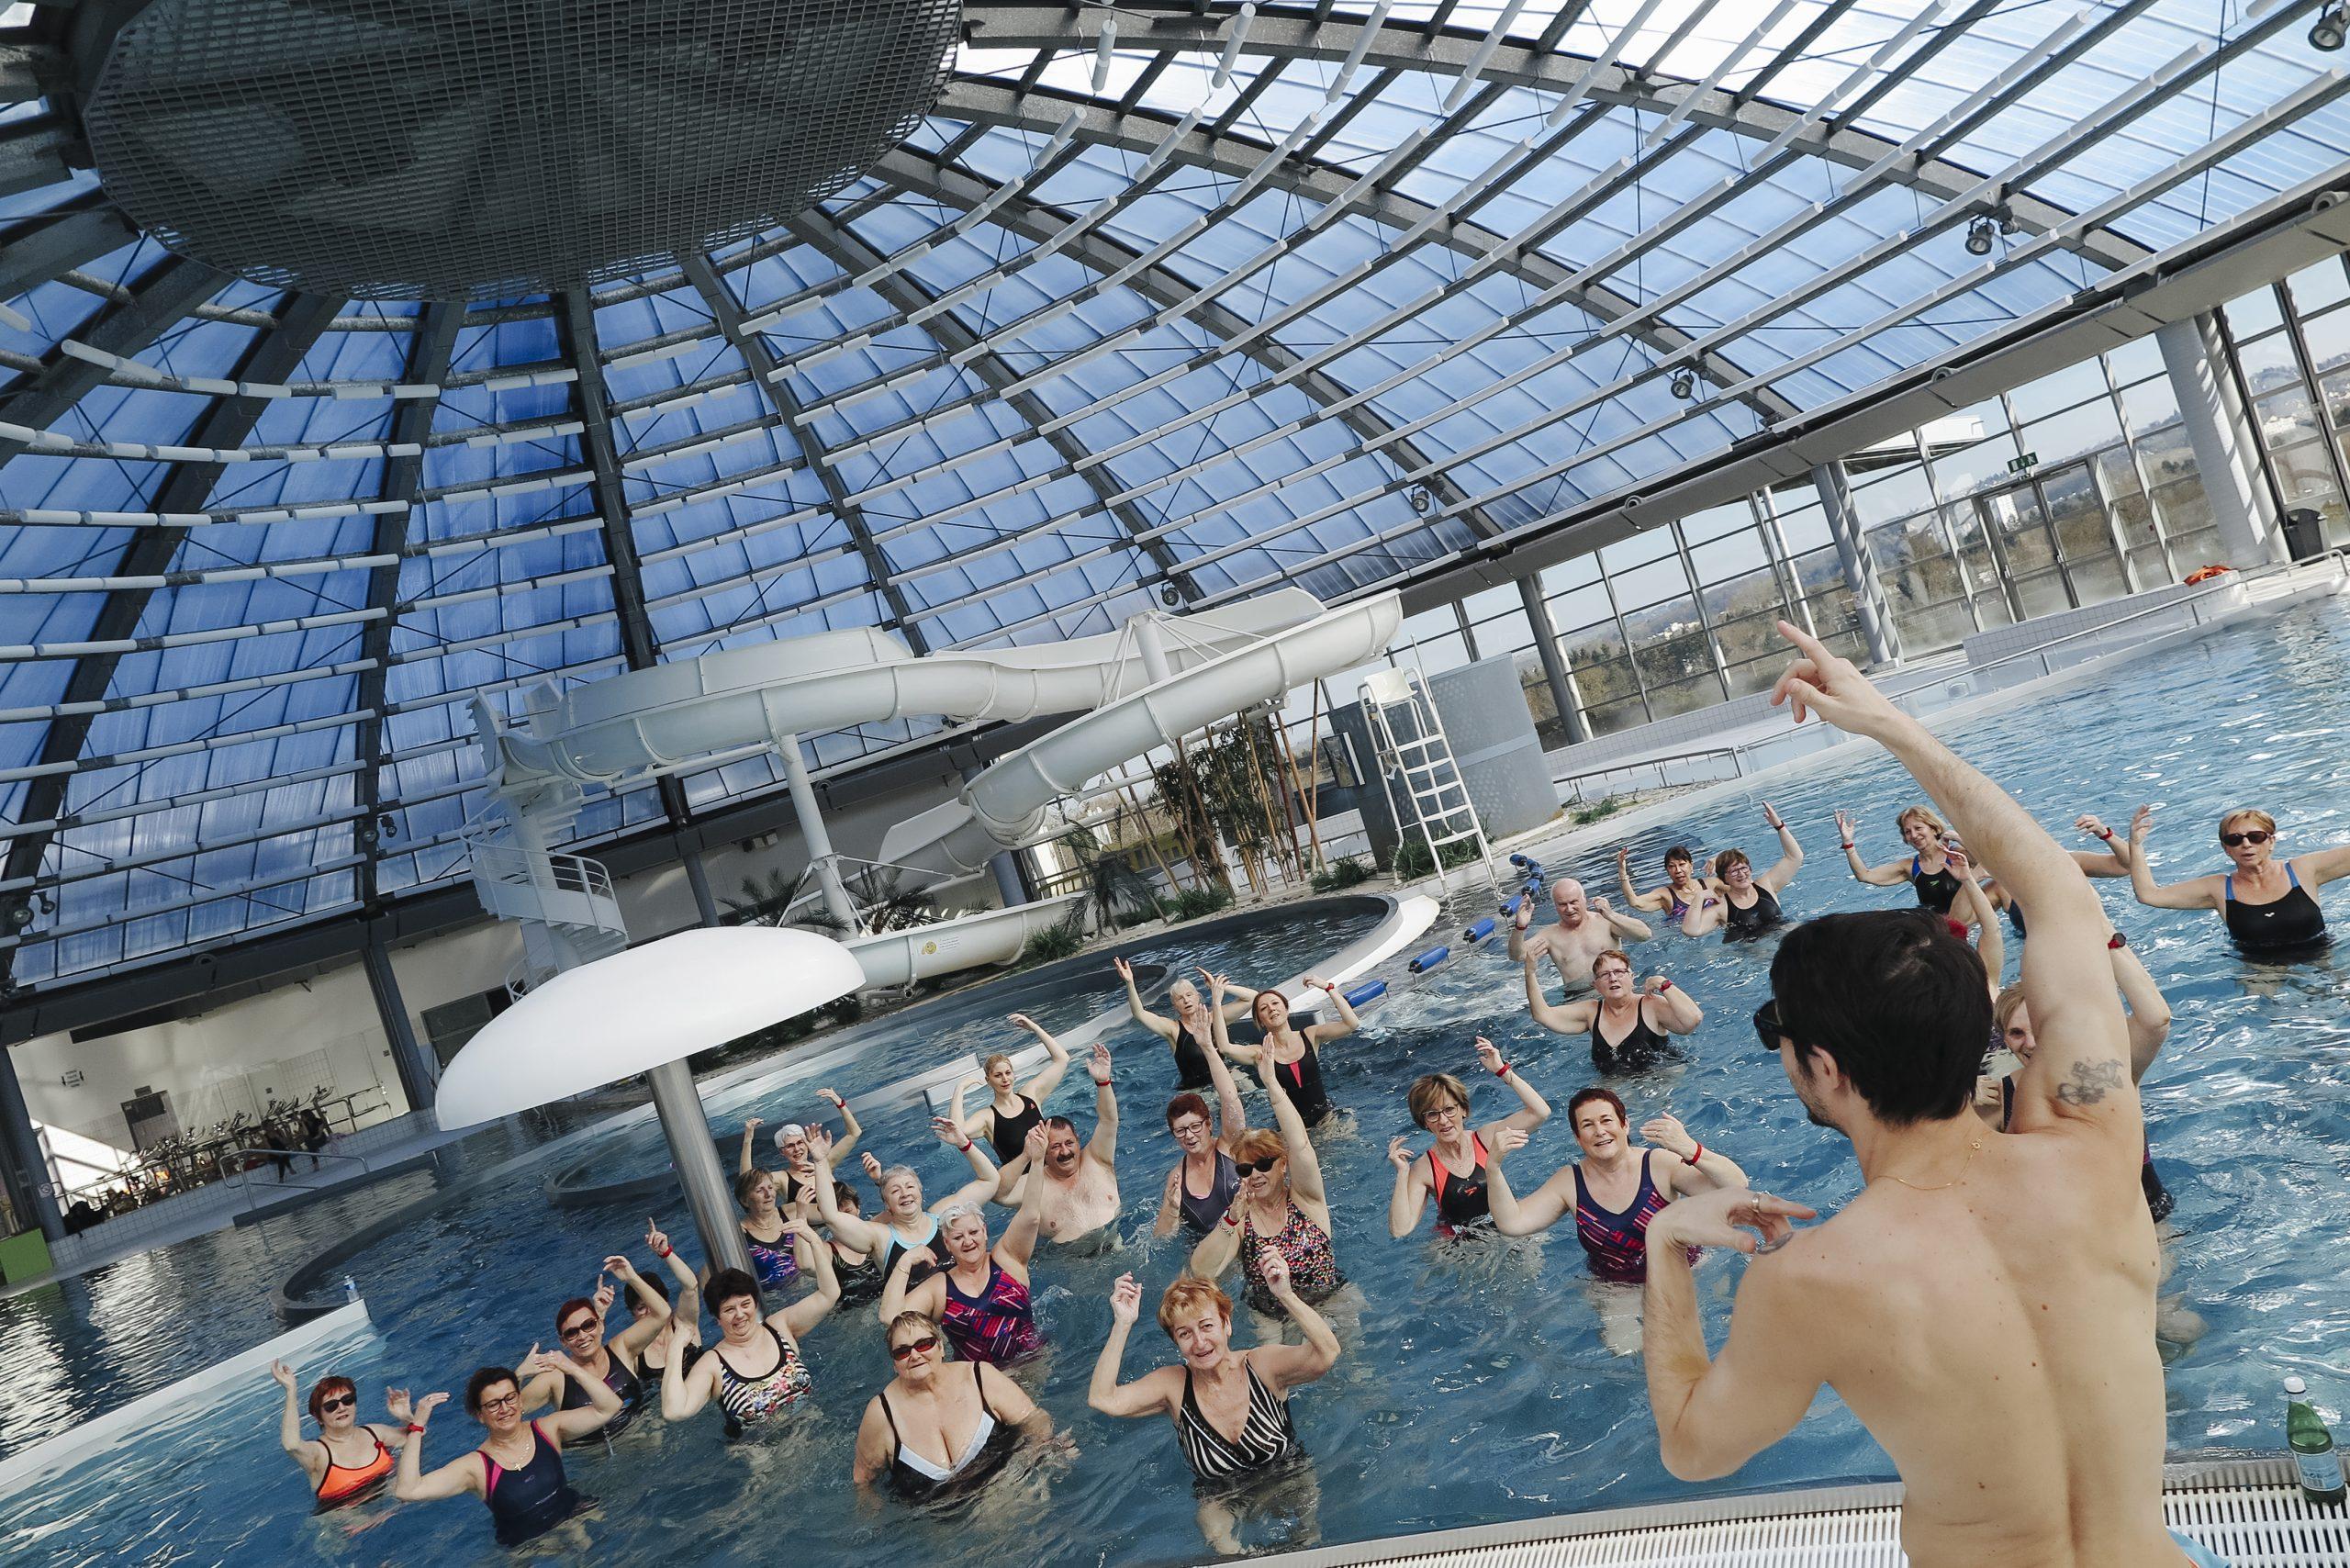 Activités Aquatiques - Stade Aquatique encequiconcerne Piscine Bellerive Horaire